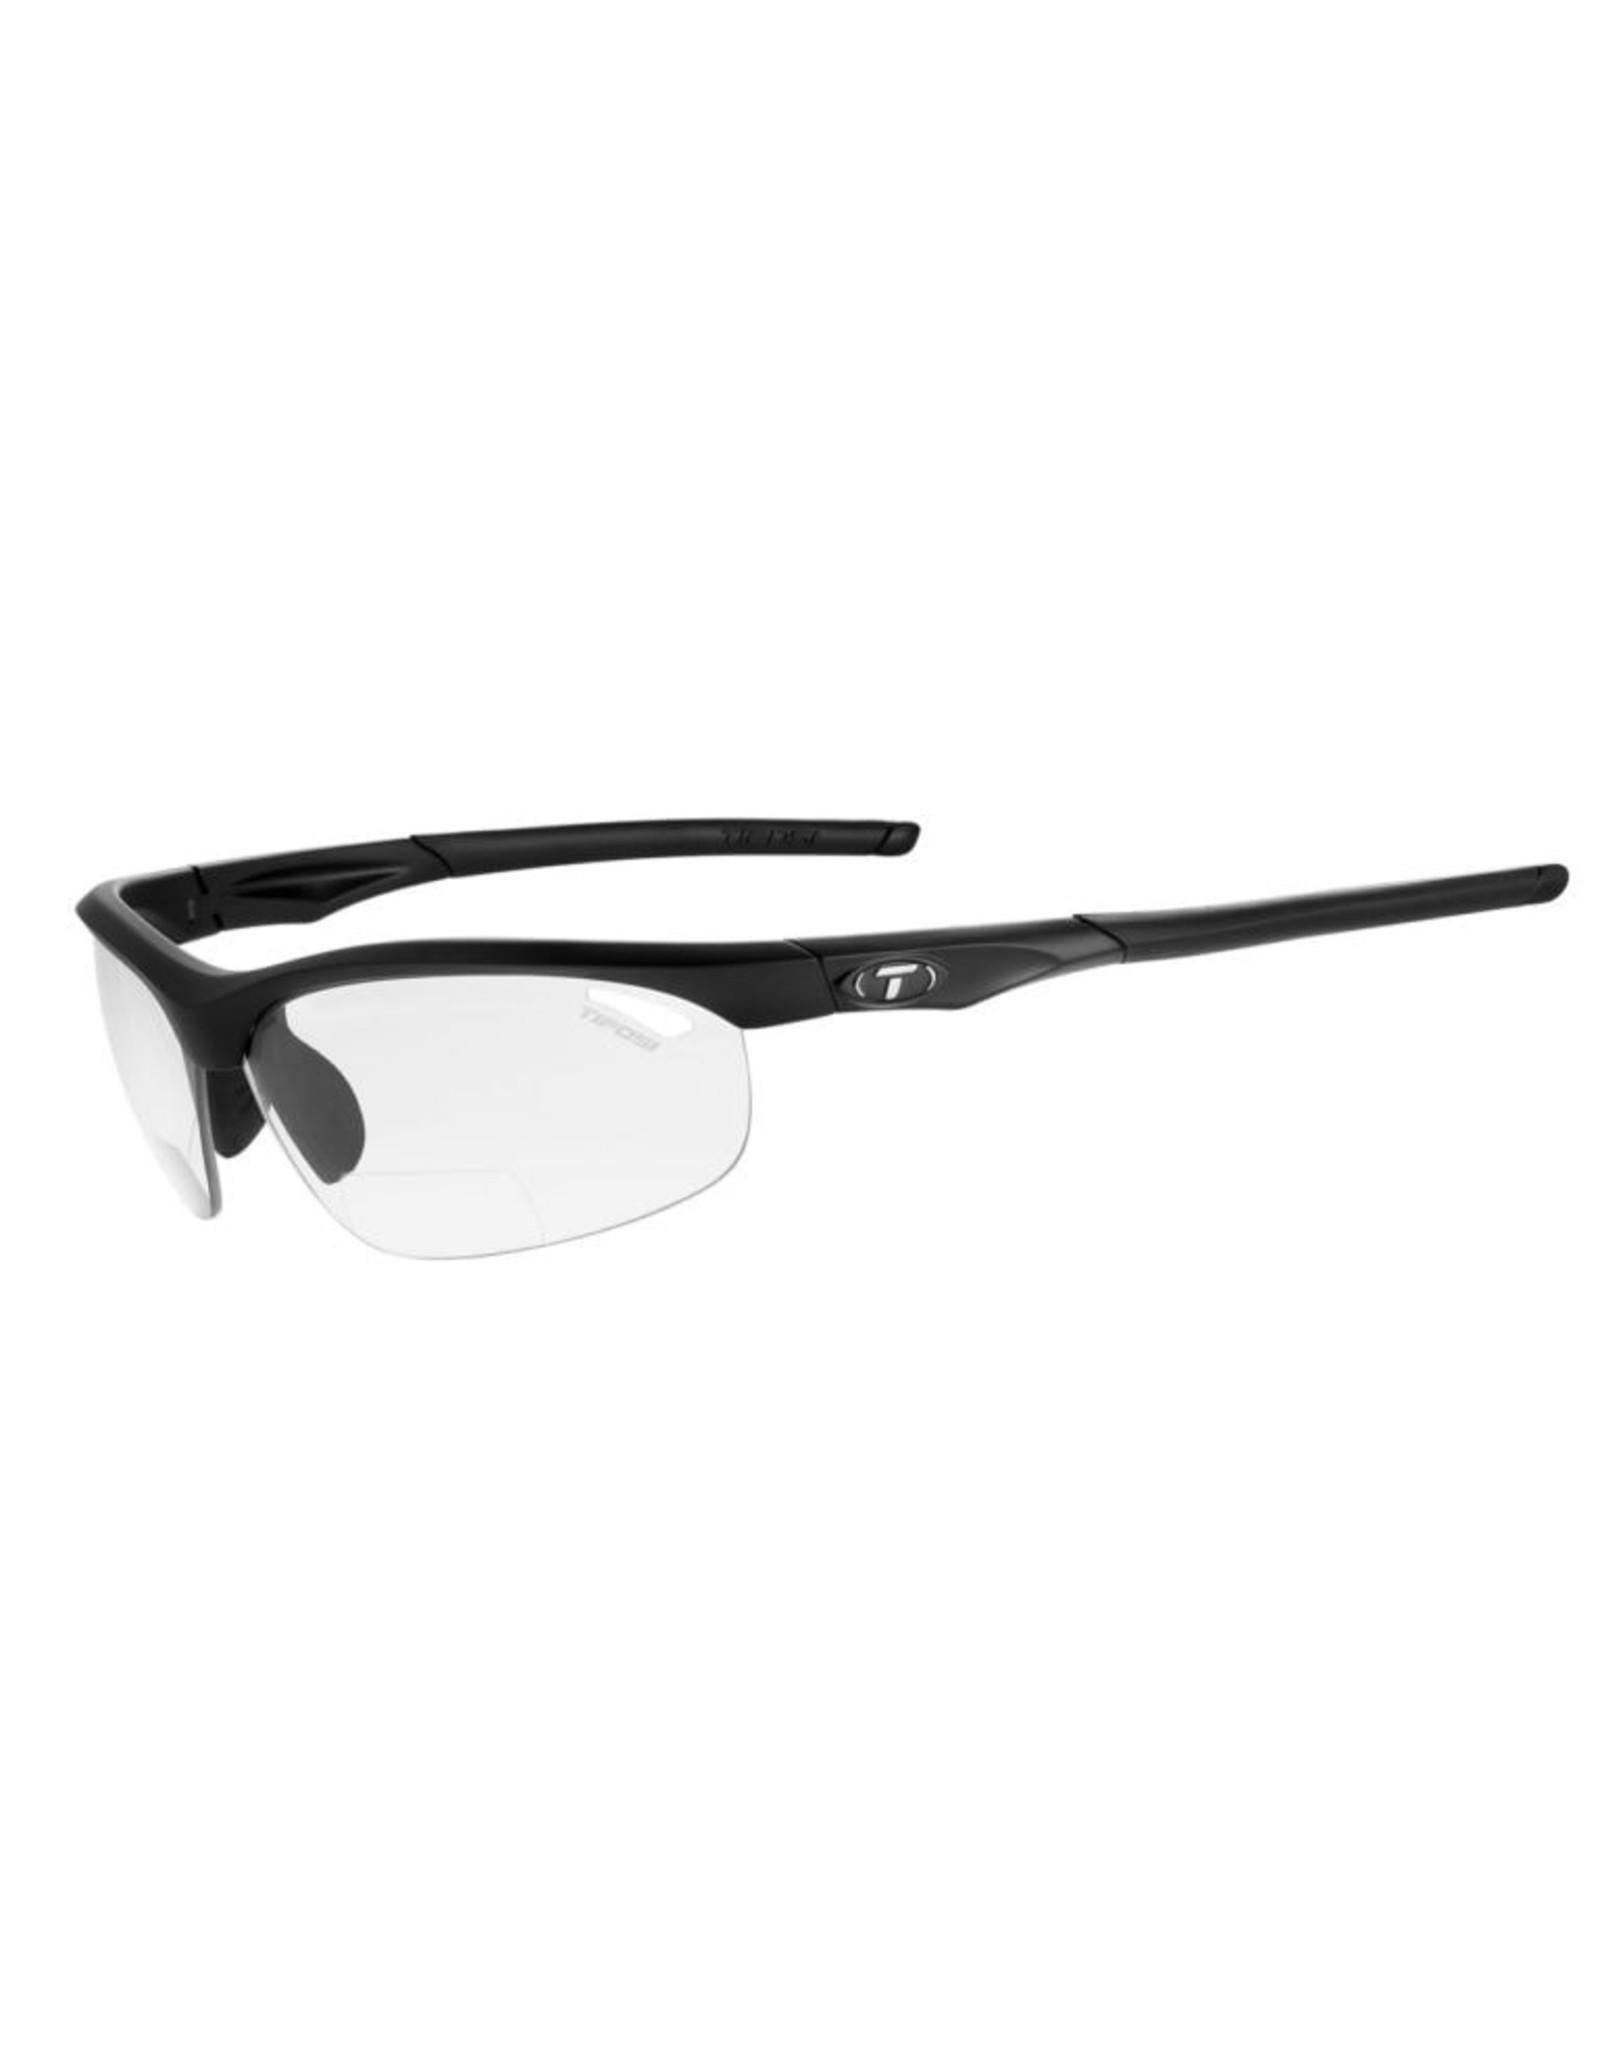 Tifosi Optics Veloce, Matte Black Foto +1.5 Reader Lens Sunglasses - Light Night Fototec +1.5